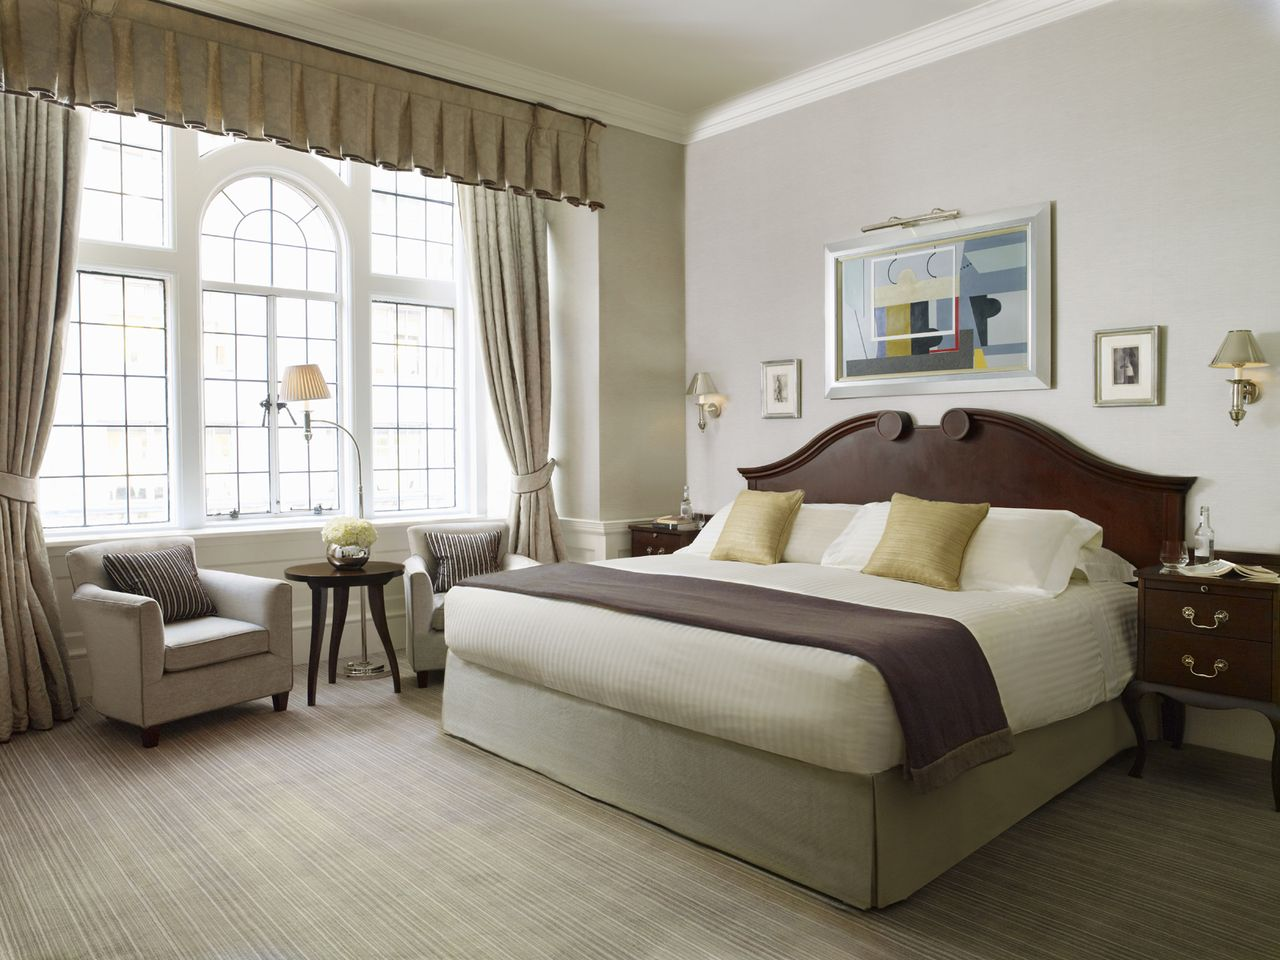 UK-England-London-The Connaught-Grosvenor Bedroom.jpg